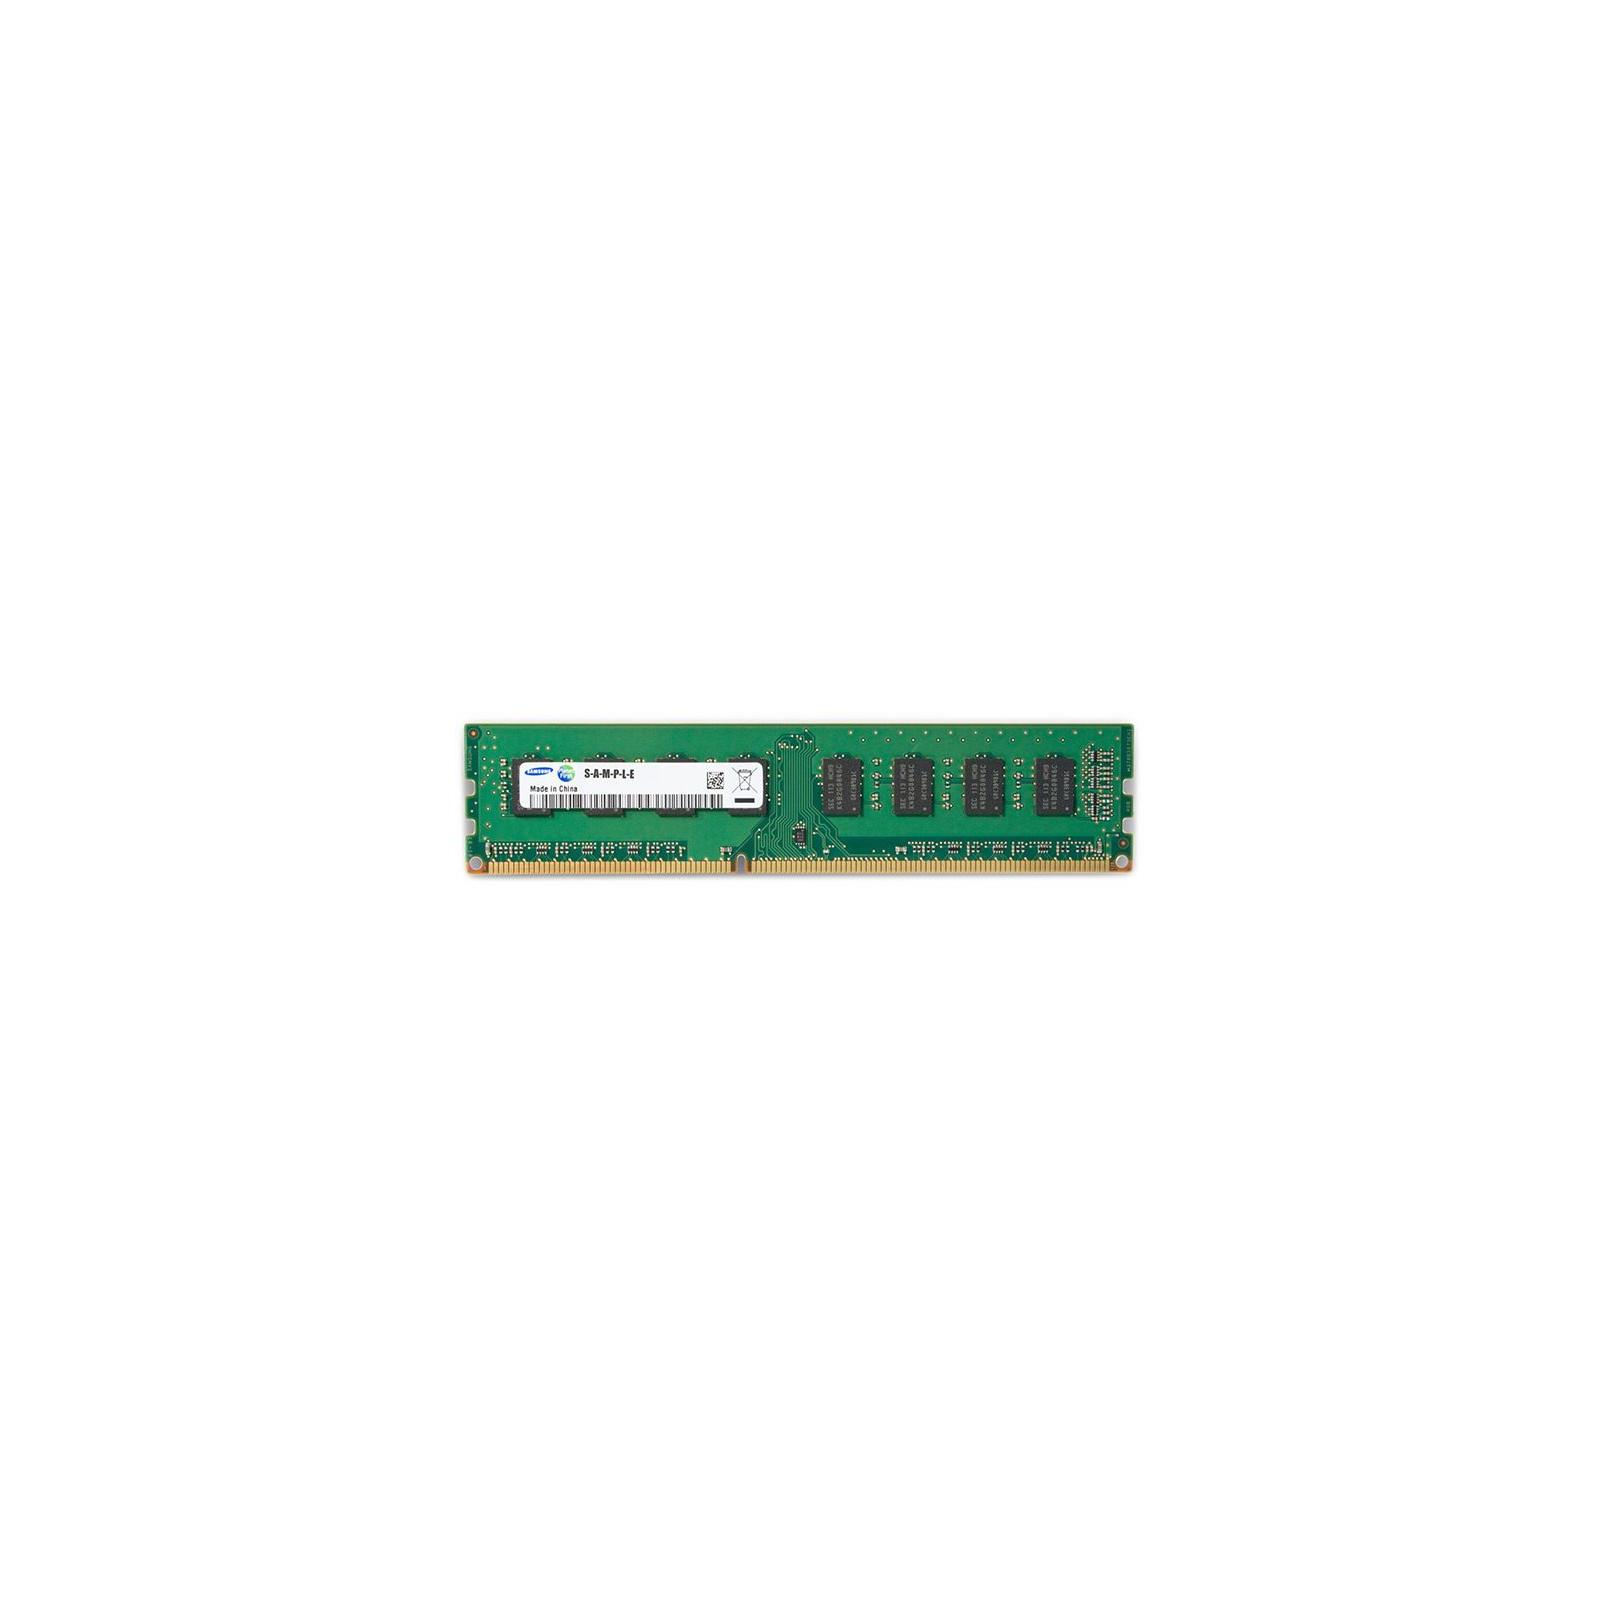 Модуль памяти для компьютера DDR3 8GB 1600 MHz Samsung (M378B1G73EB0-CK000)